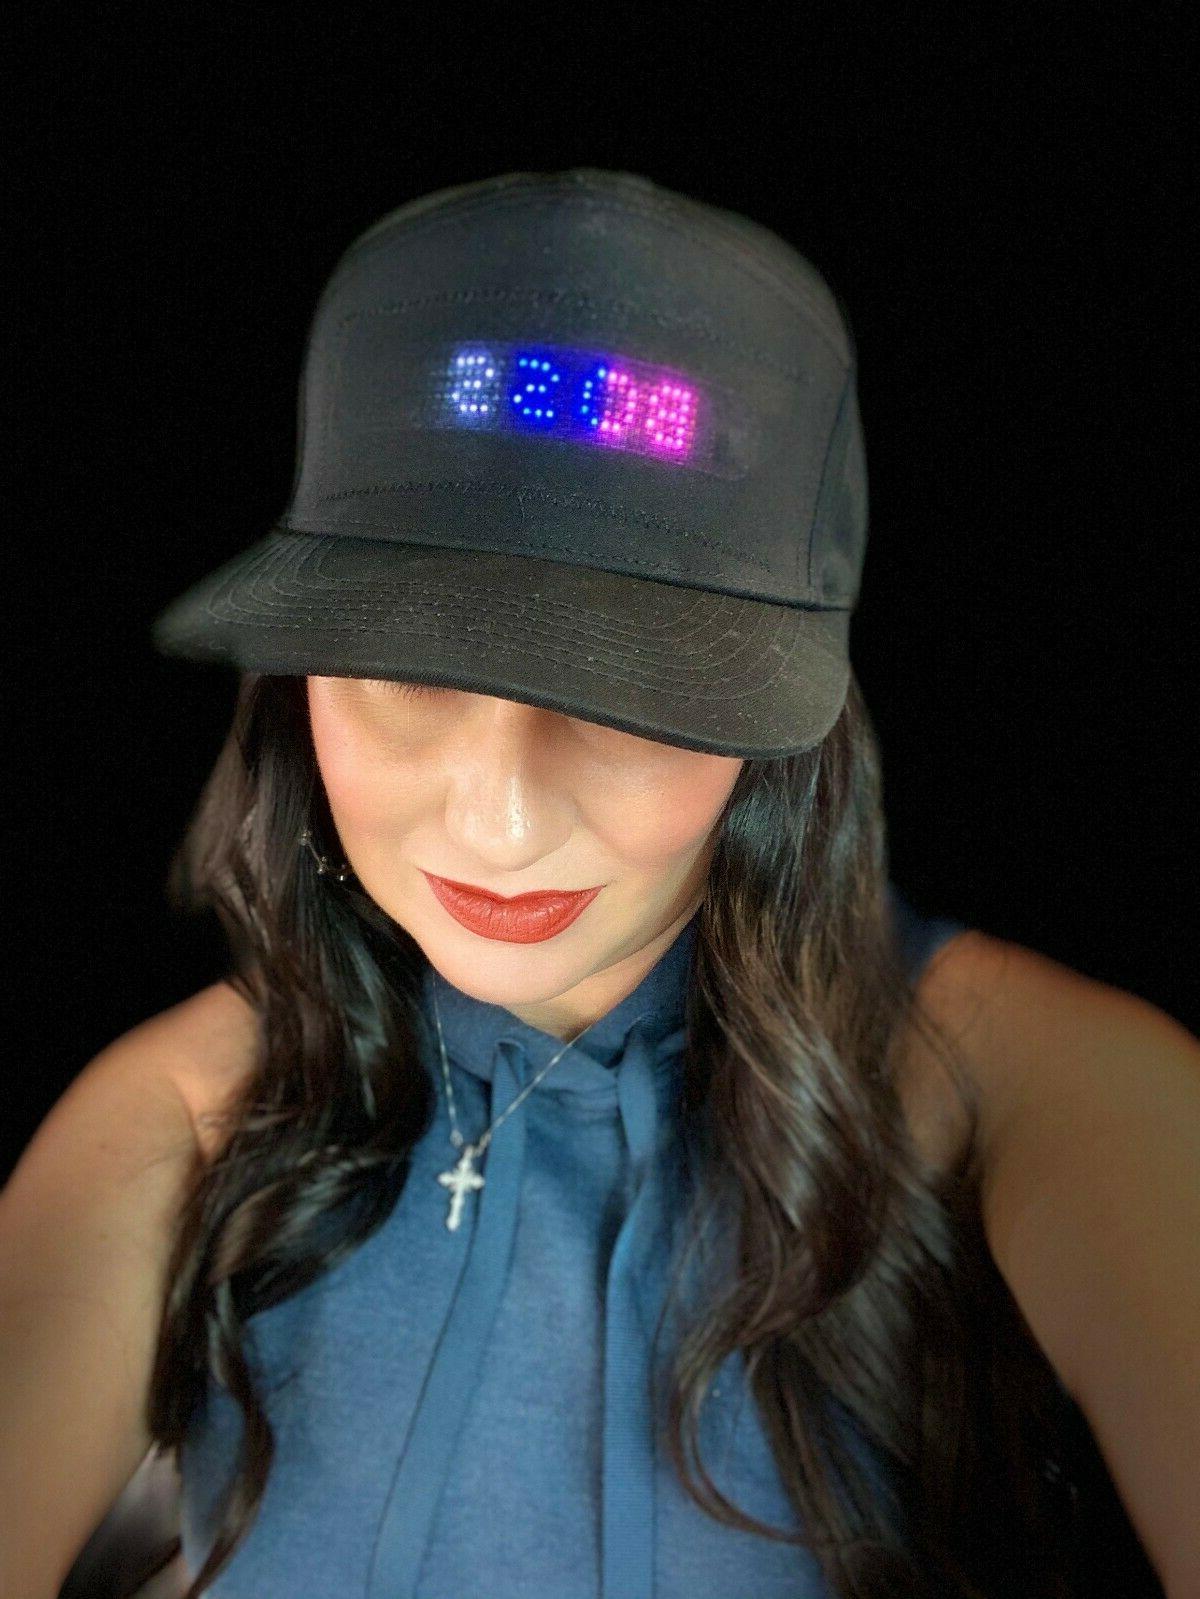 Animated LED Bluetooth Cap